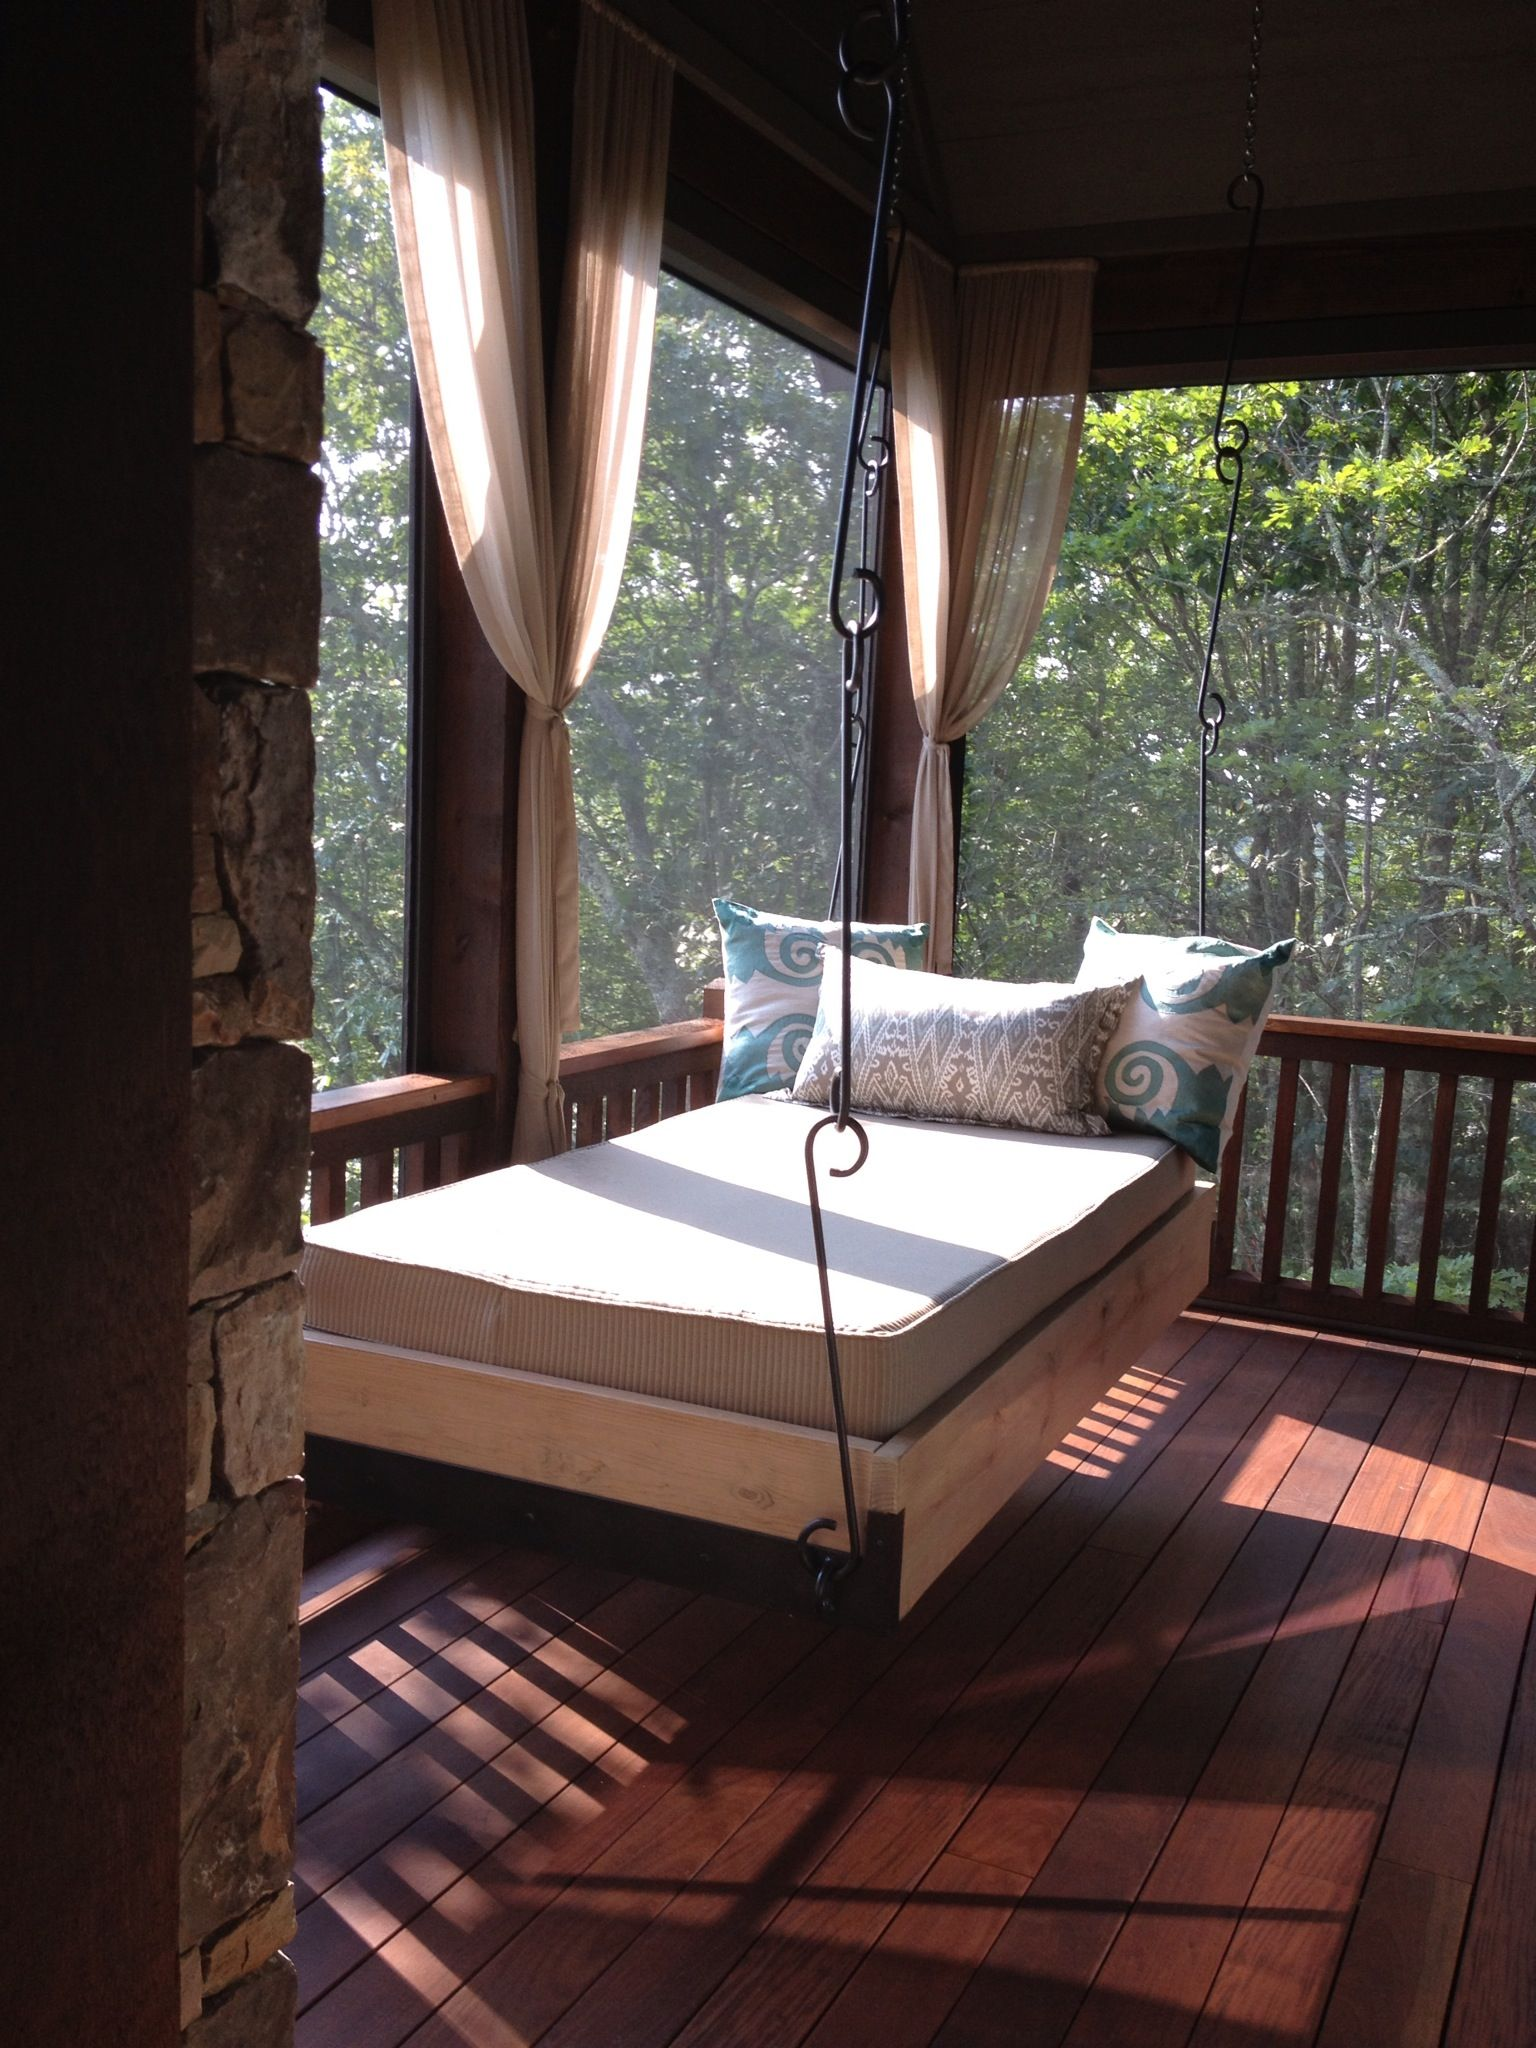 My new outdoor bed | Outdoor bed, Outdoor rooms, Outdoor ... on My Backyard Living id=78235